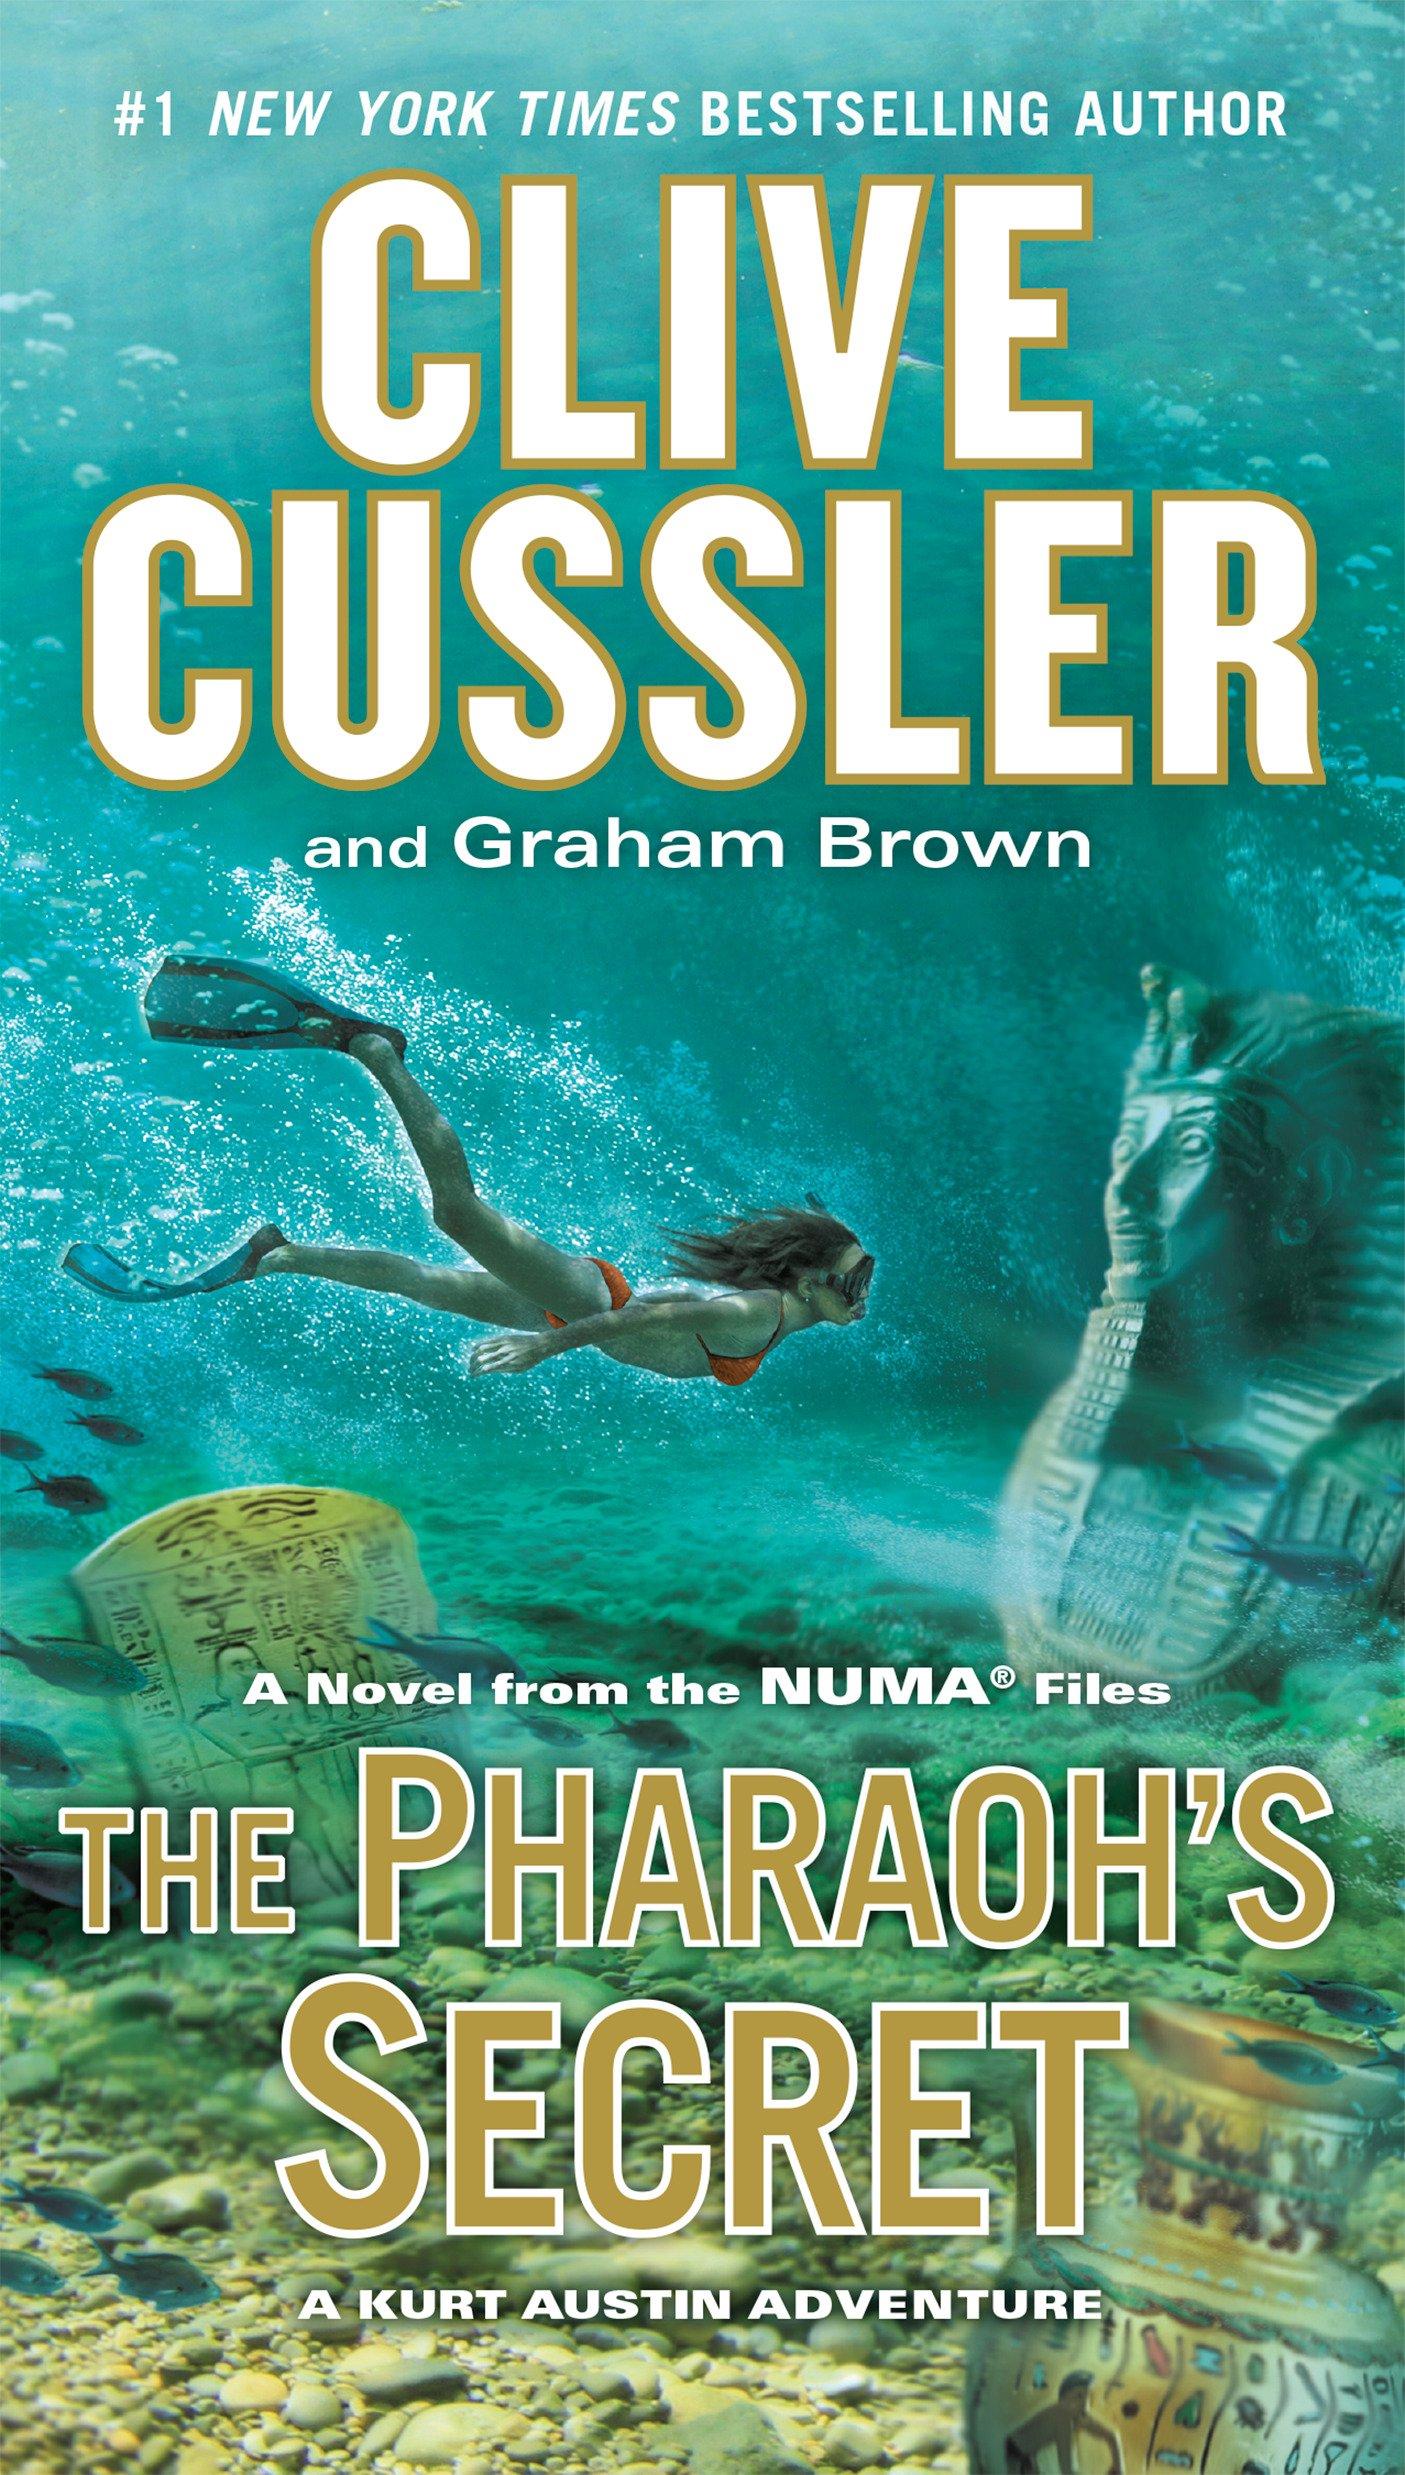 Pharaohs Secret NUMA Files product image